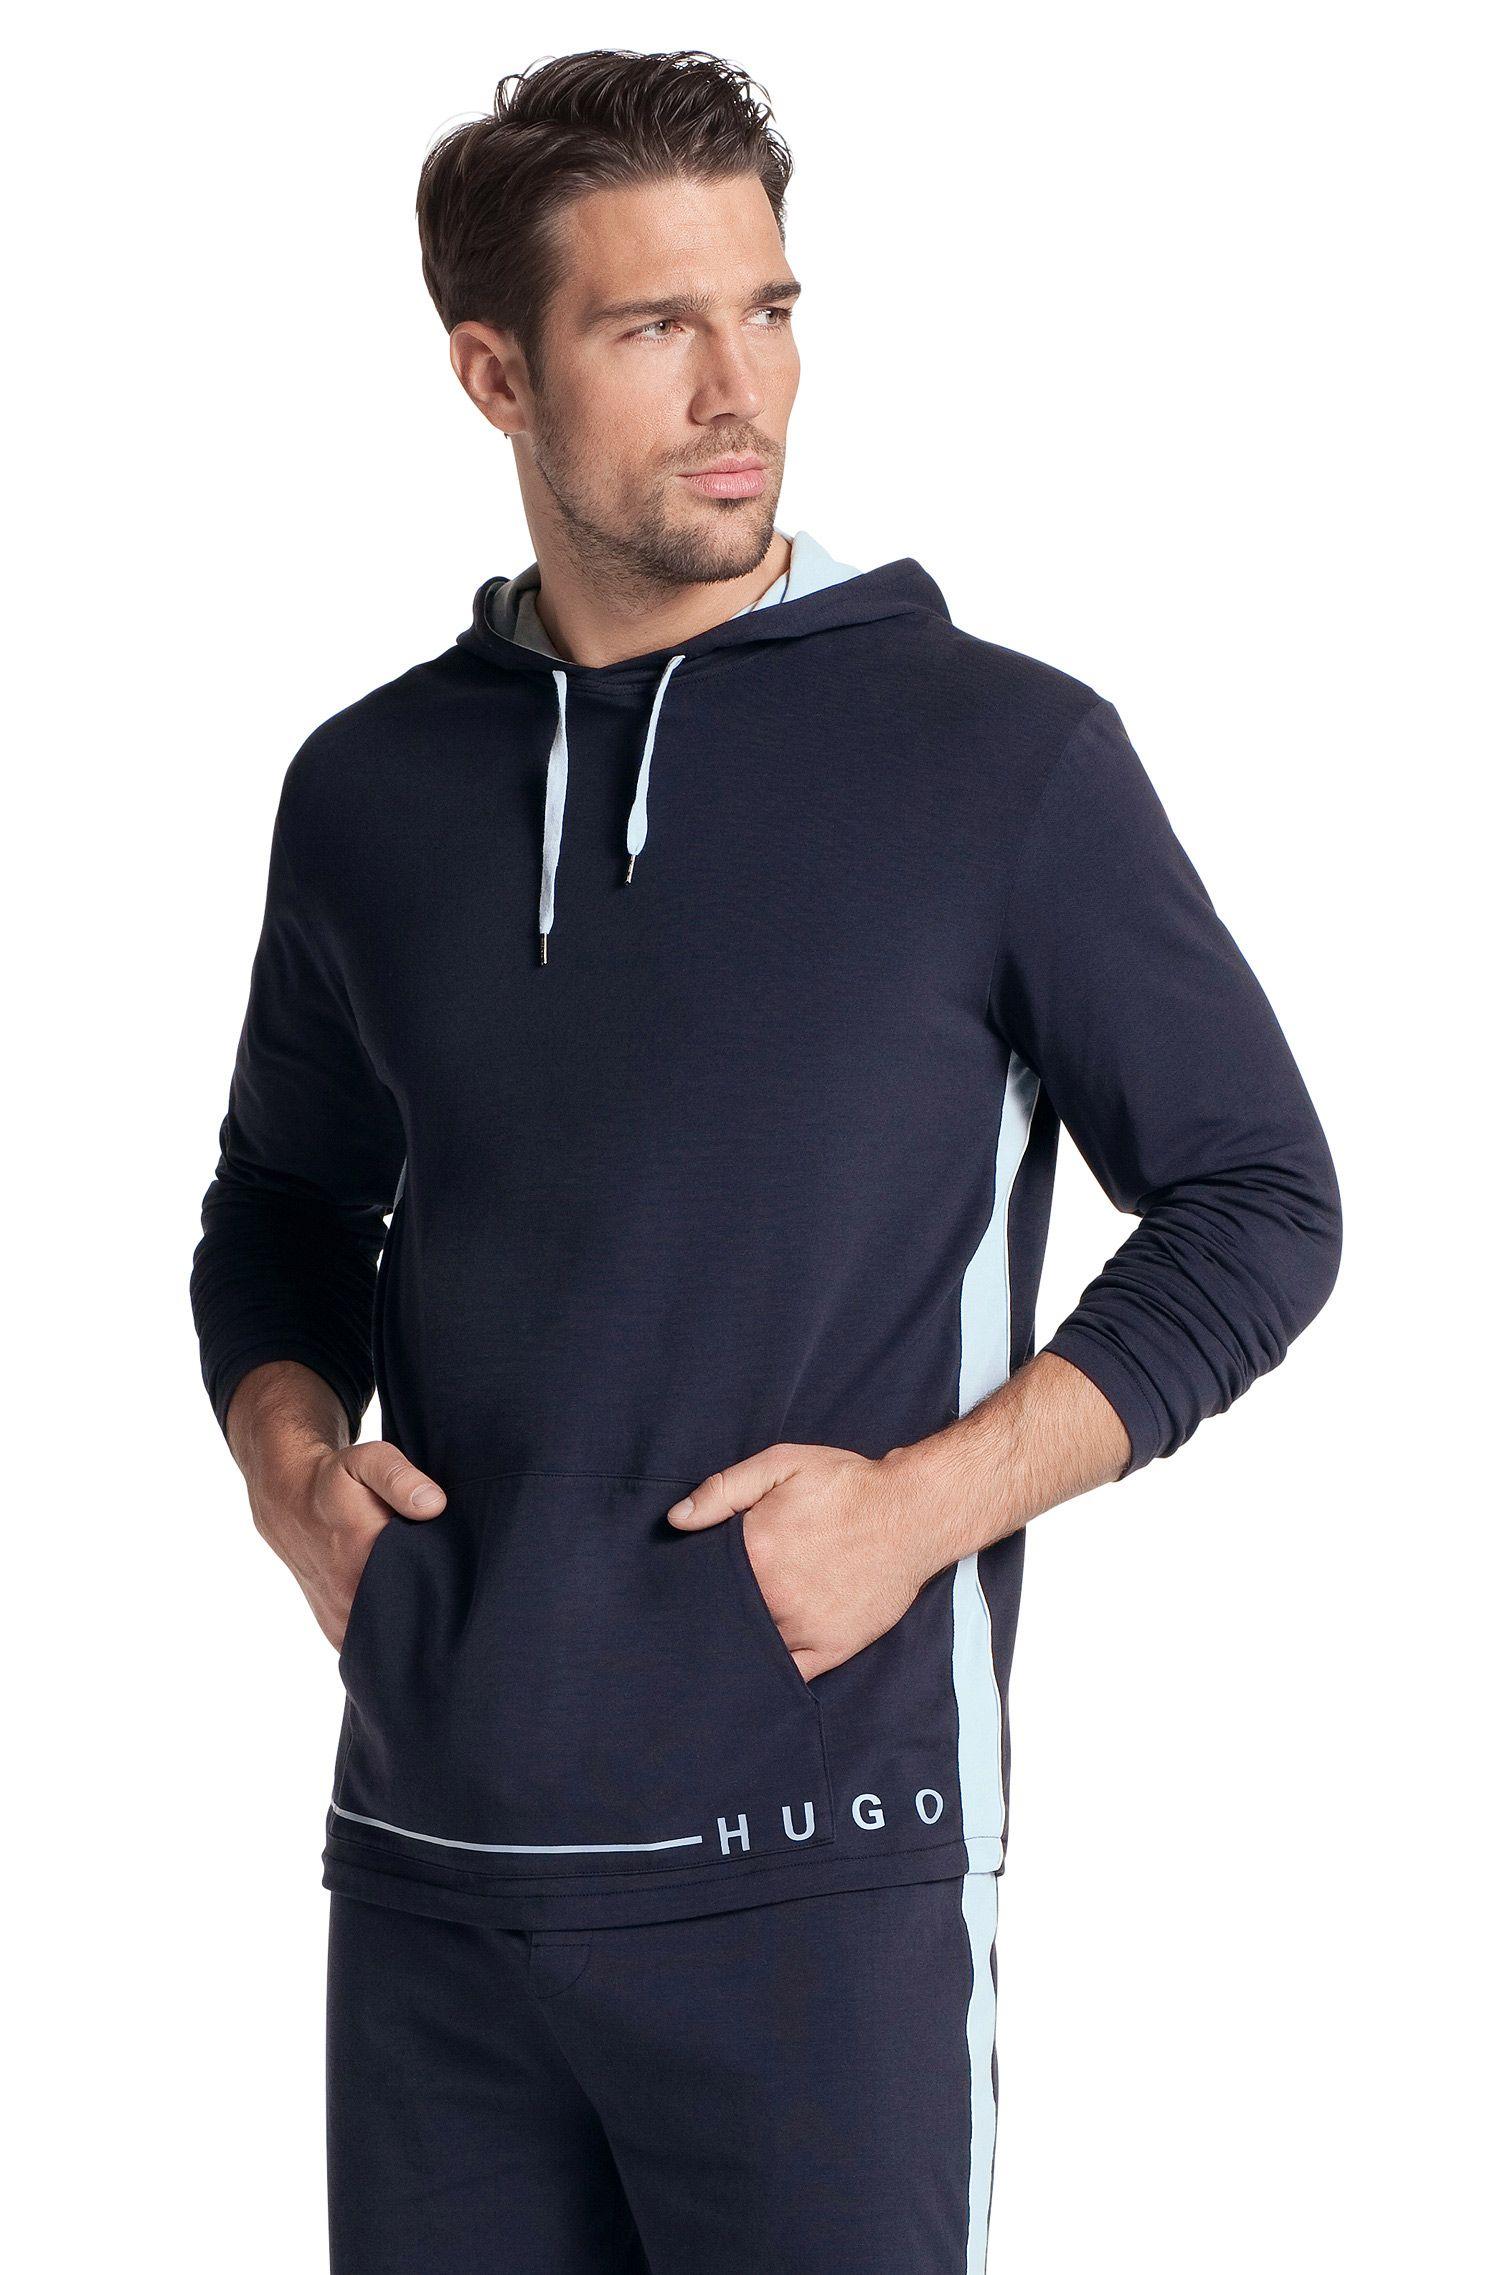 Sweatshirt ´Shirt Hooded LS BM` mit Kapuze